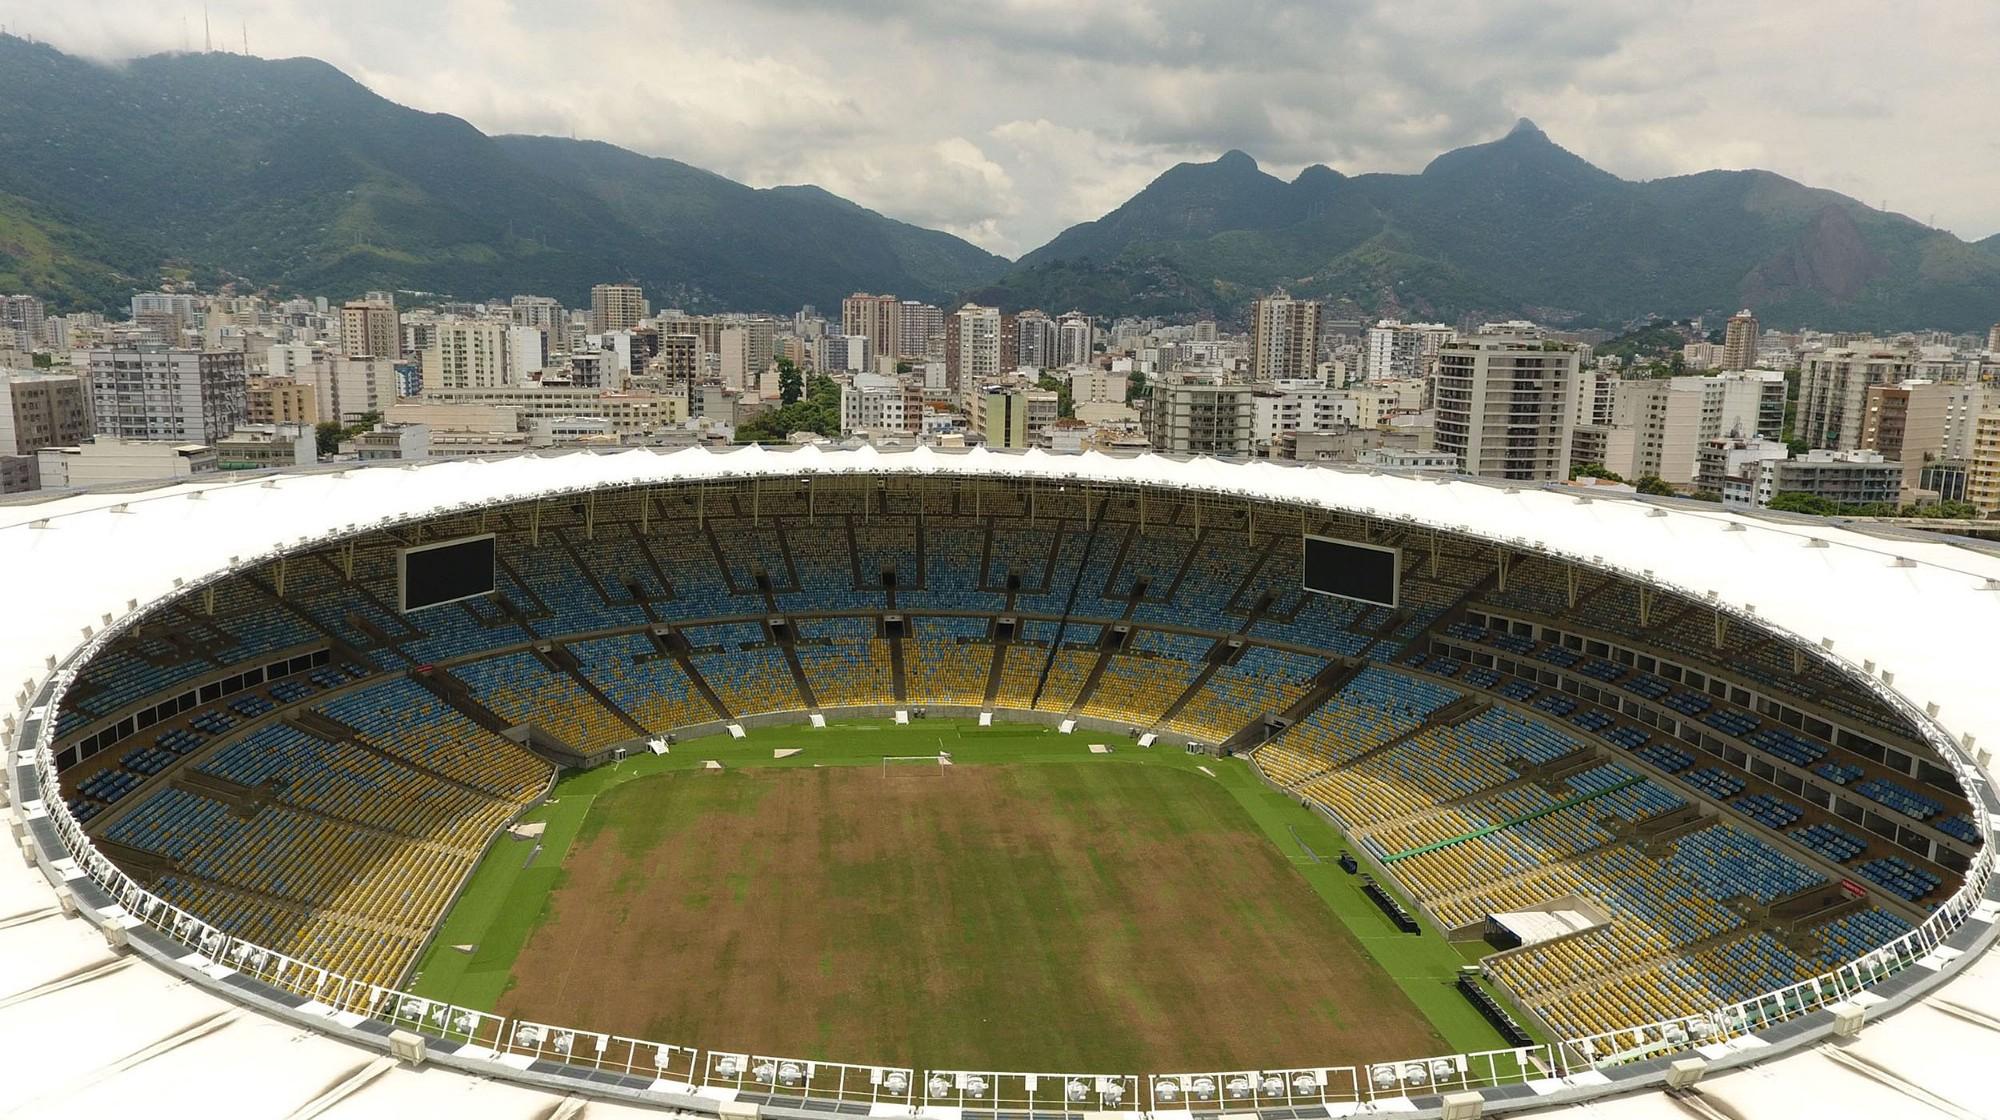 The famed Maracana Stadium has gone to waste |  VANDERLEI ALMEIDA/AFP/Getty Images